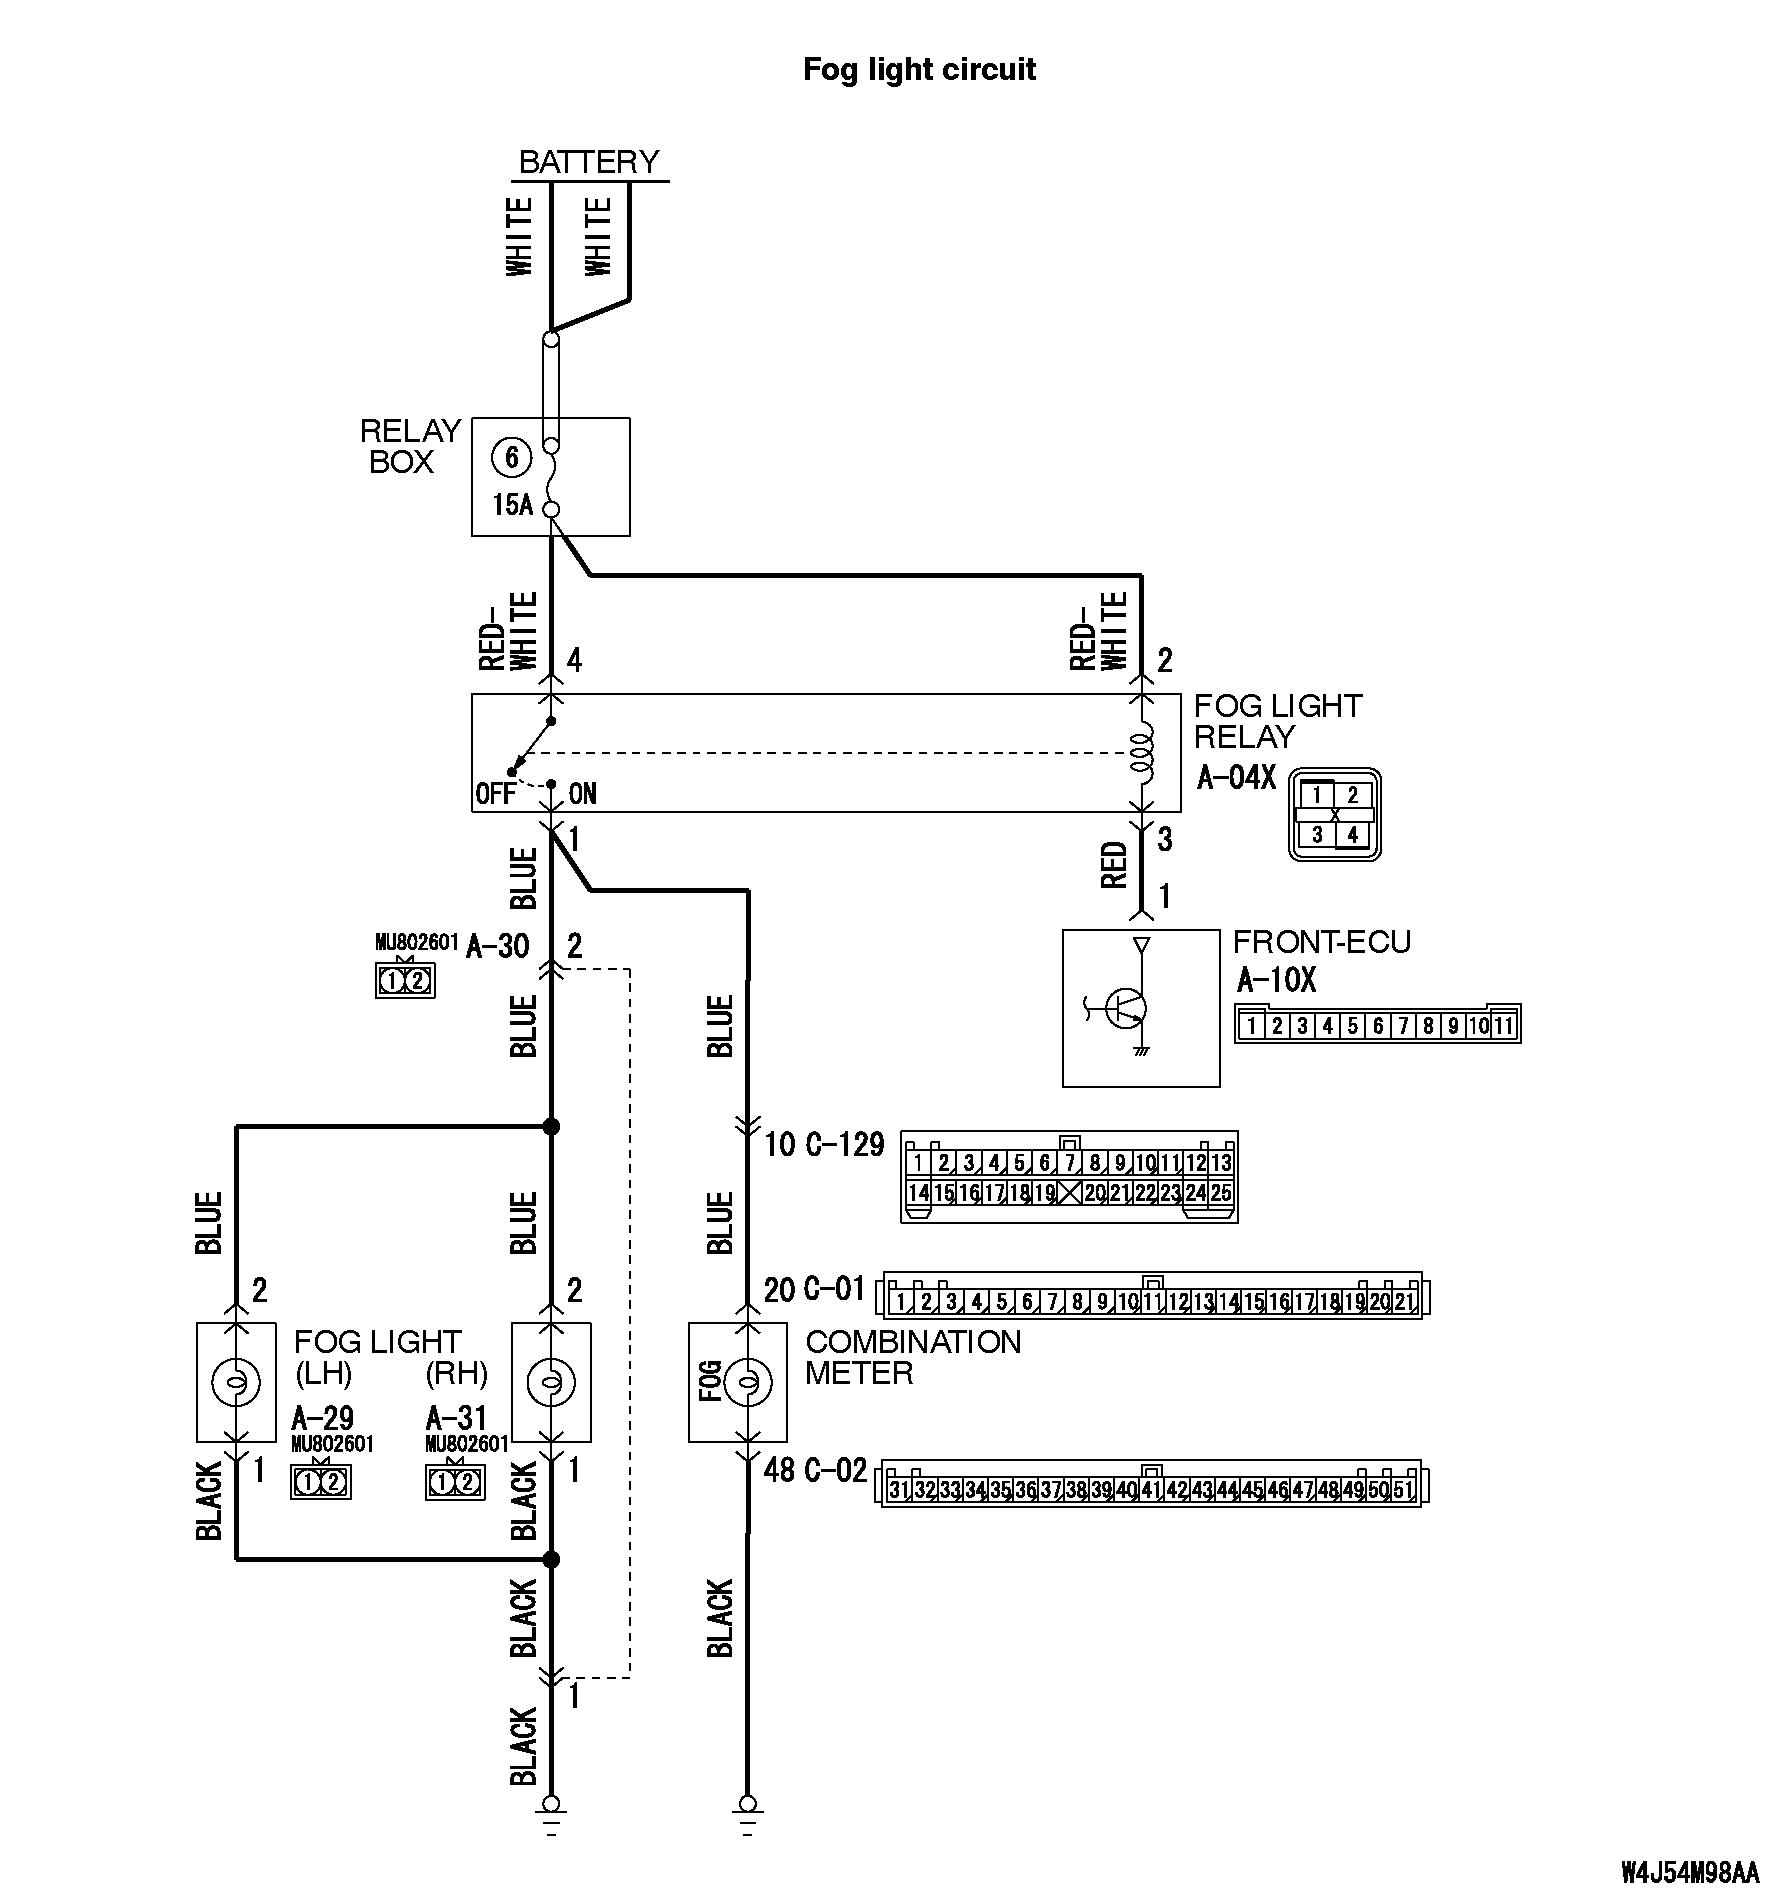 95405d1156140537 ralliart stock fog light wiring diagram m2285404_00330?resize\\\\\\\\\\\=1772%2C1902\\\\\\\\\\\&ssl\\\\\\\\\\\=1 boss bv9560b wiring diagram gandul 45 77 79 119 Crutchfield Car Stereo Wire Diagram at creativeand.co